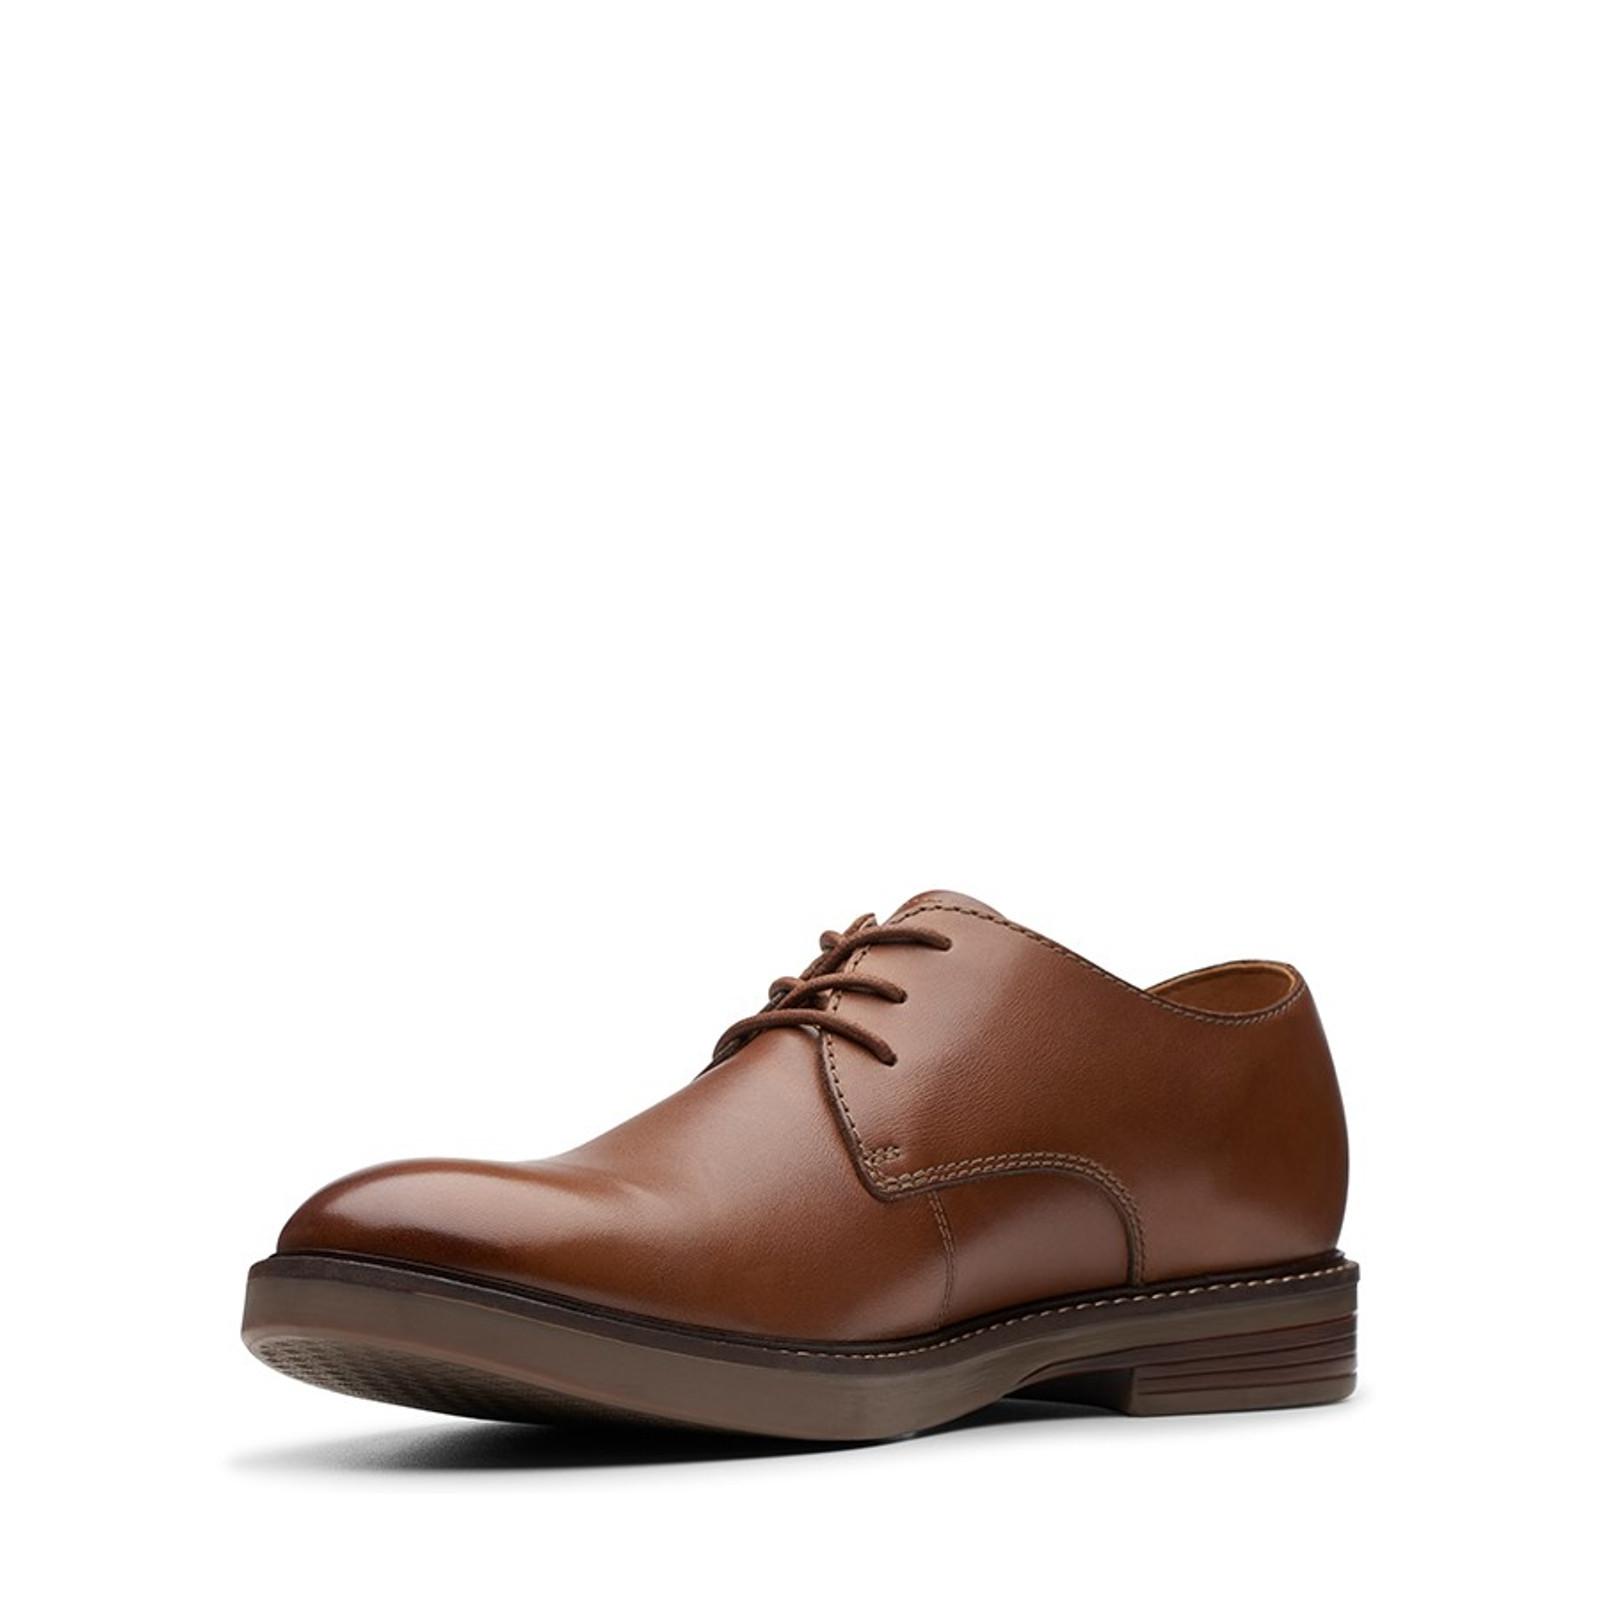 Clarks Mens PAULSON PLAIN Tan Leather